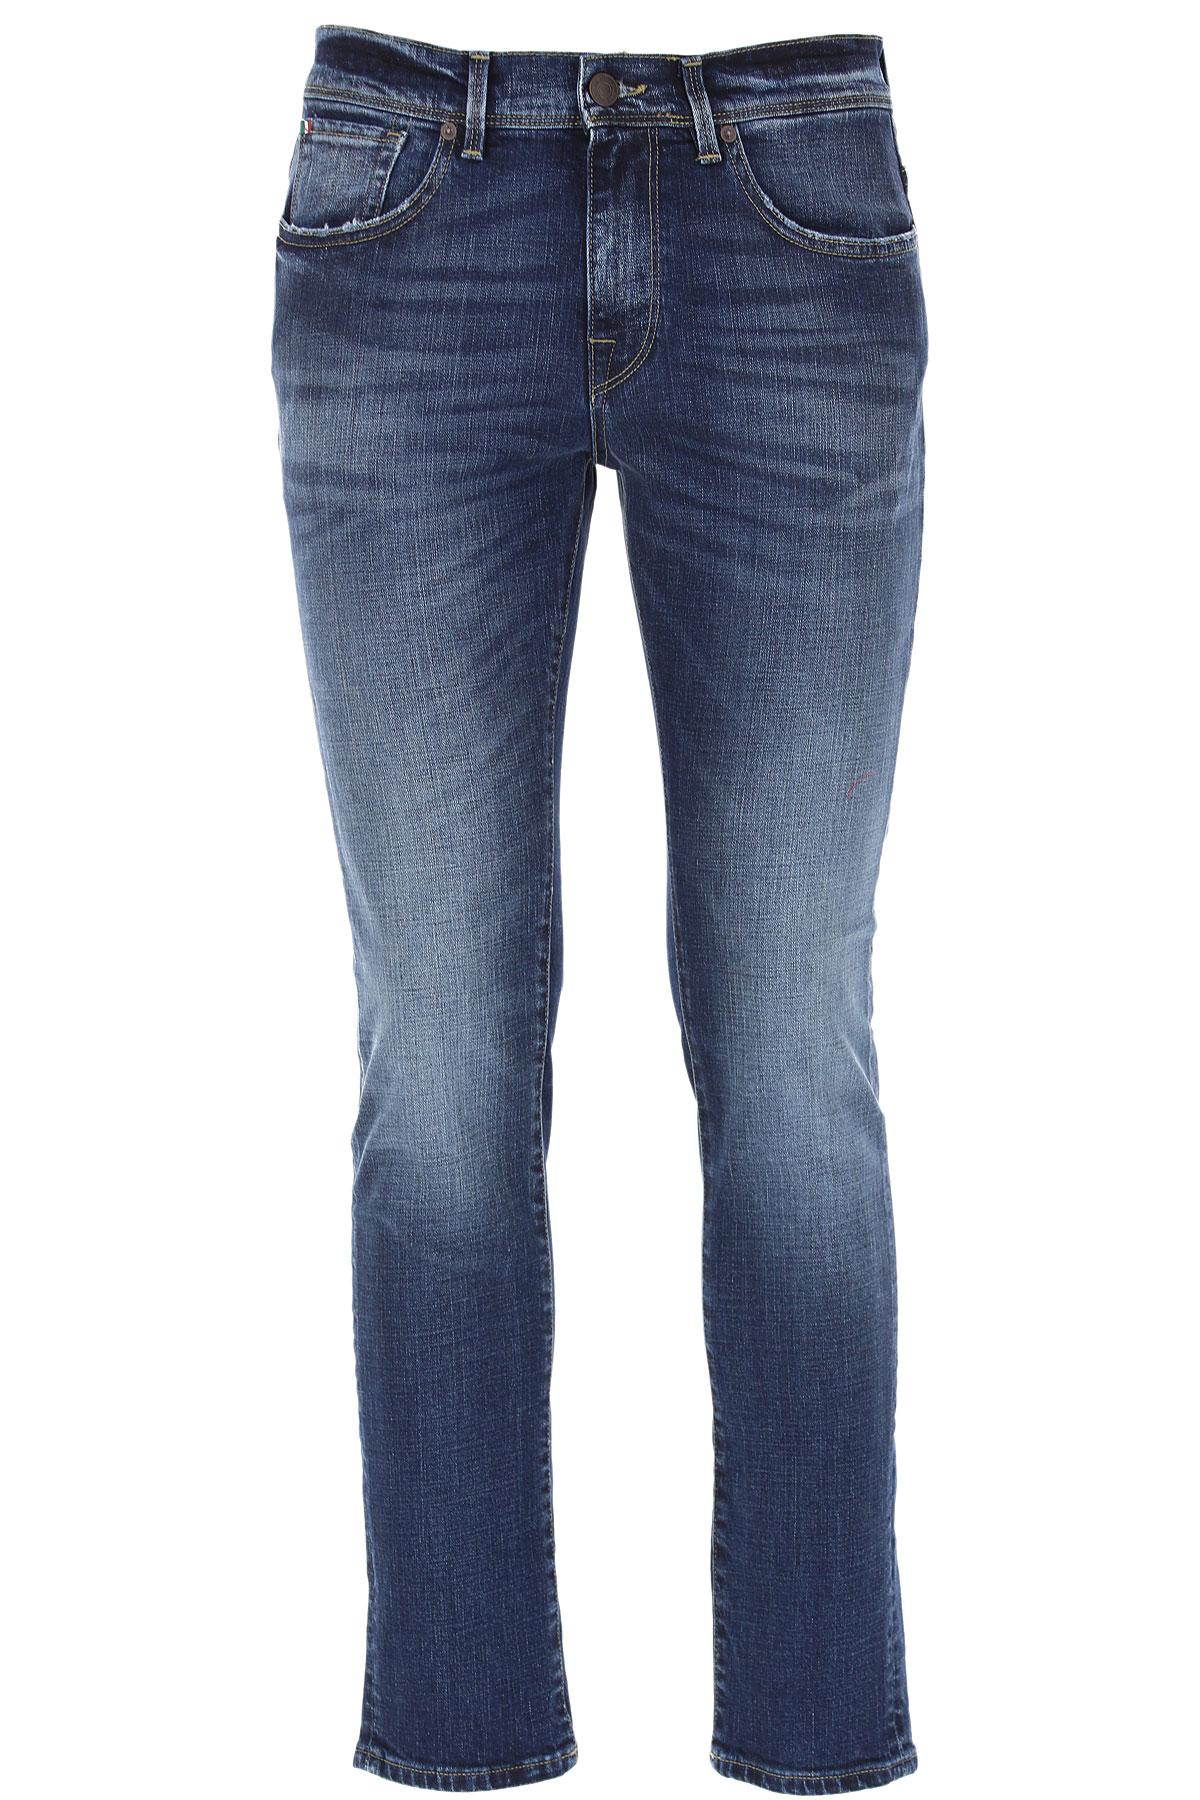 Selected Jeans On Sale, Denim, Cotton, 2019, 30 31 32 34 35